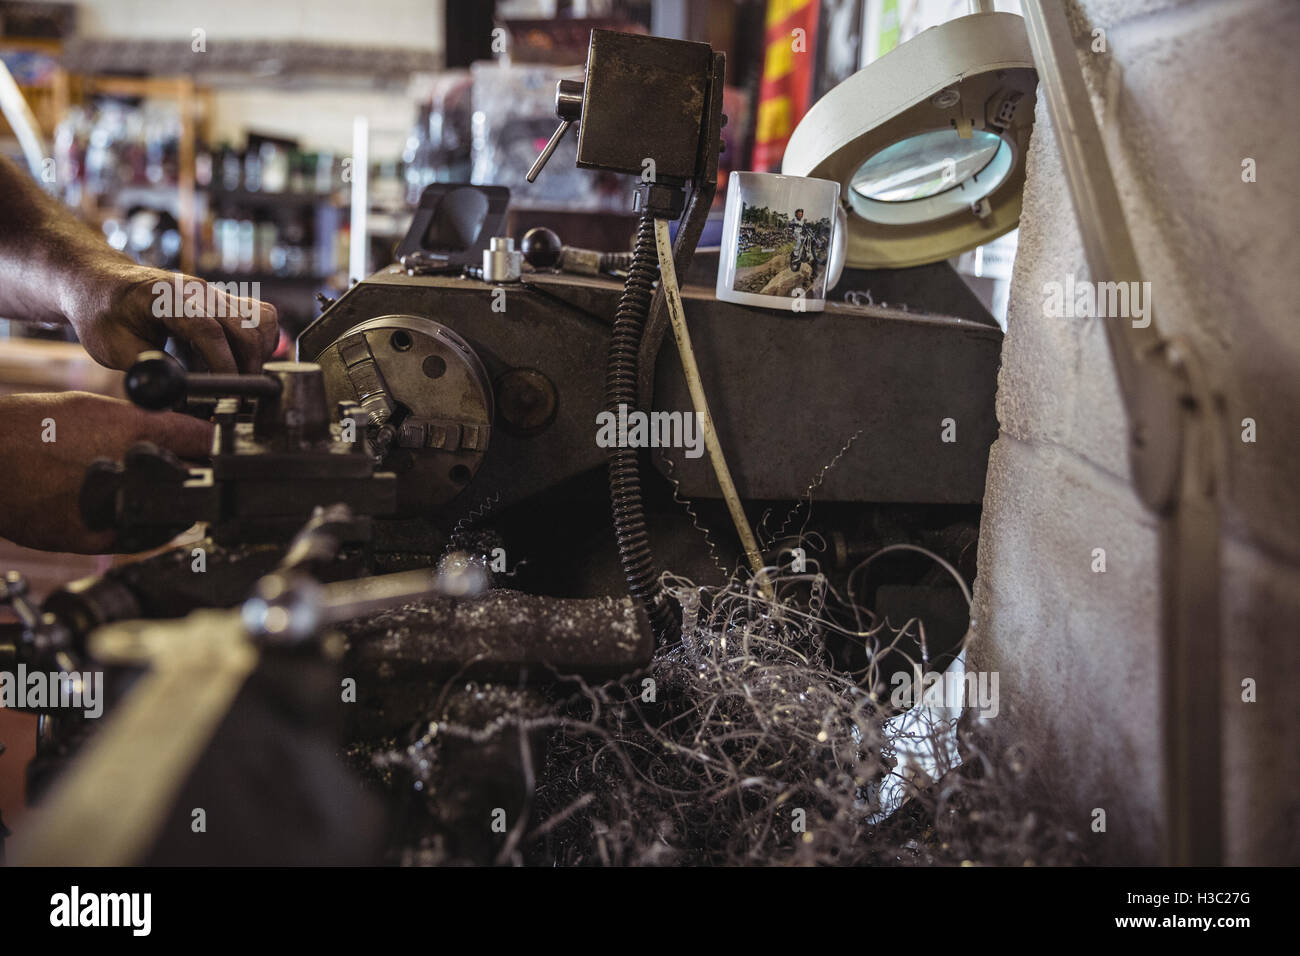 Mechanic working on a lathe machine - Stock Image